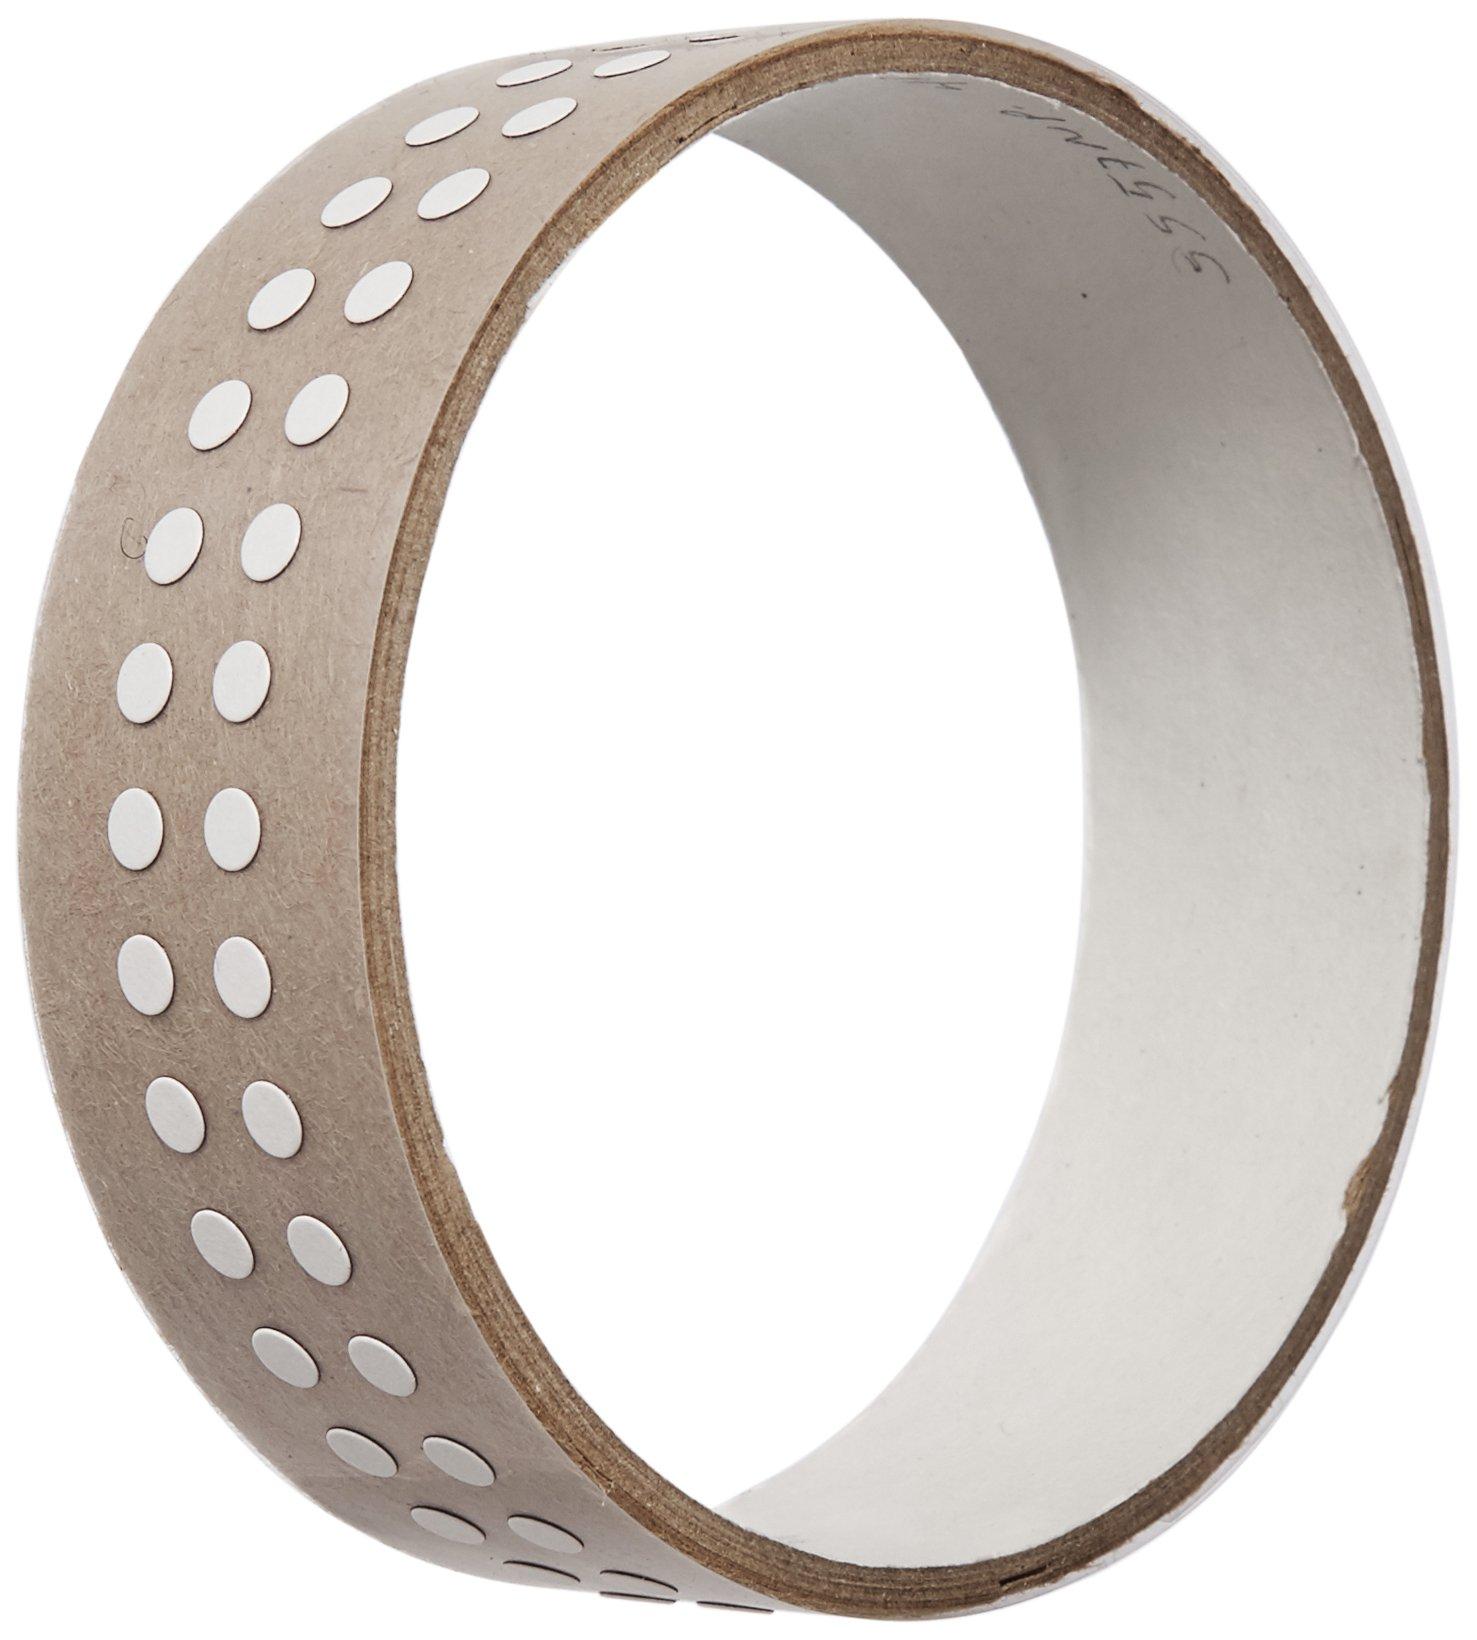 3M 5557 Contact Indicator Tape, 0.157 Diameter Circles (1 Pack)